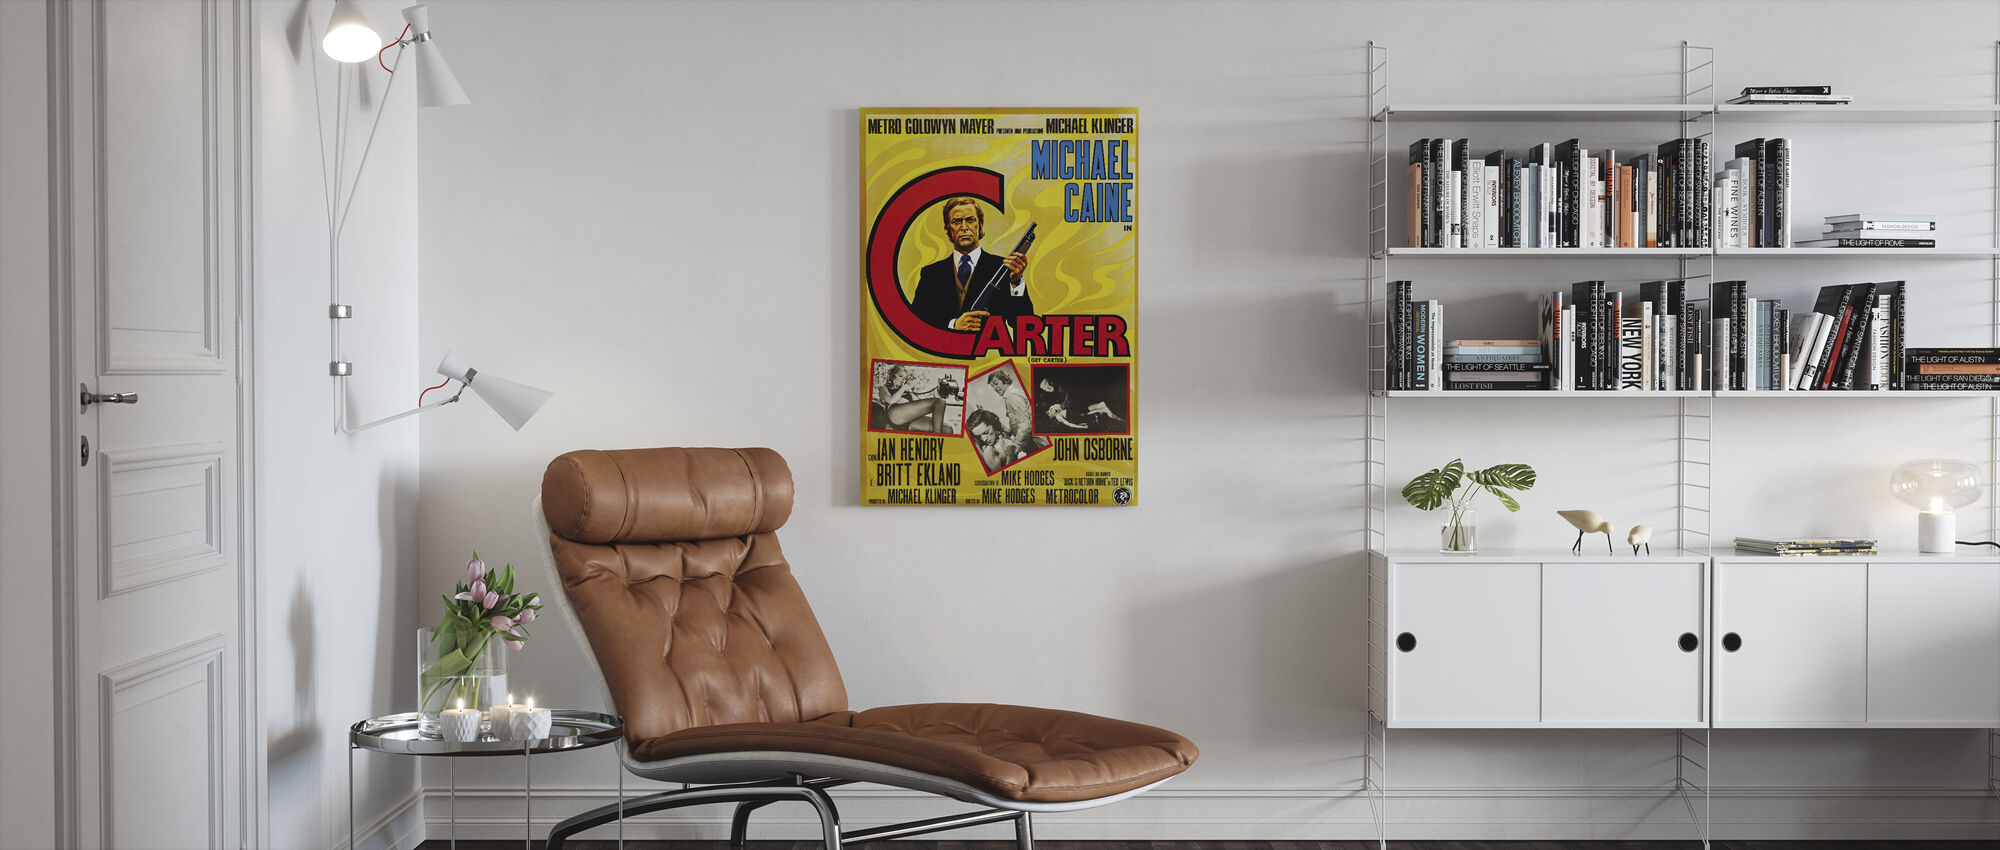 Haal Carter - Canvas print - Woonkamer